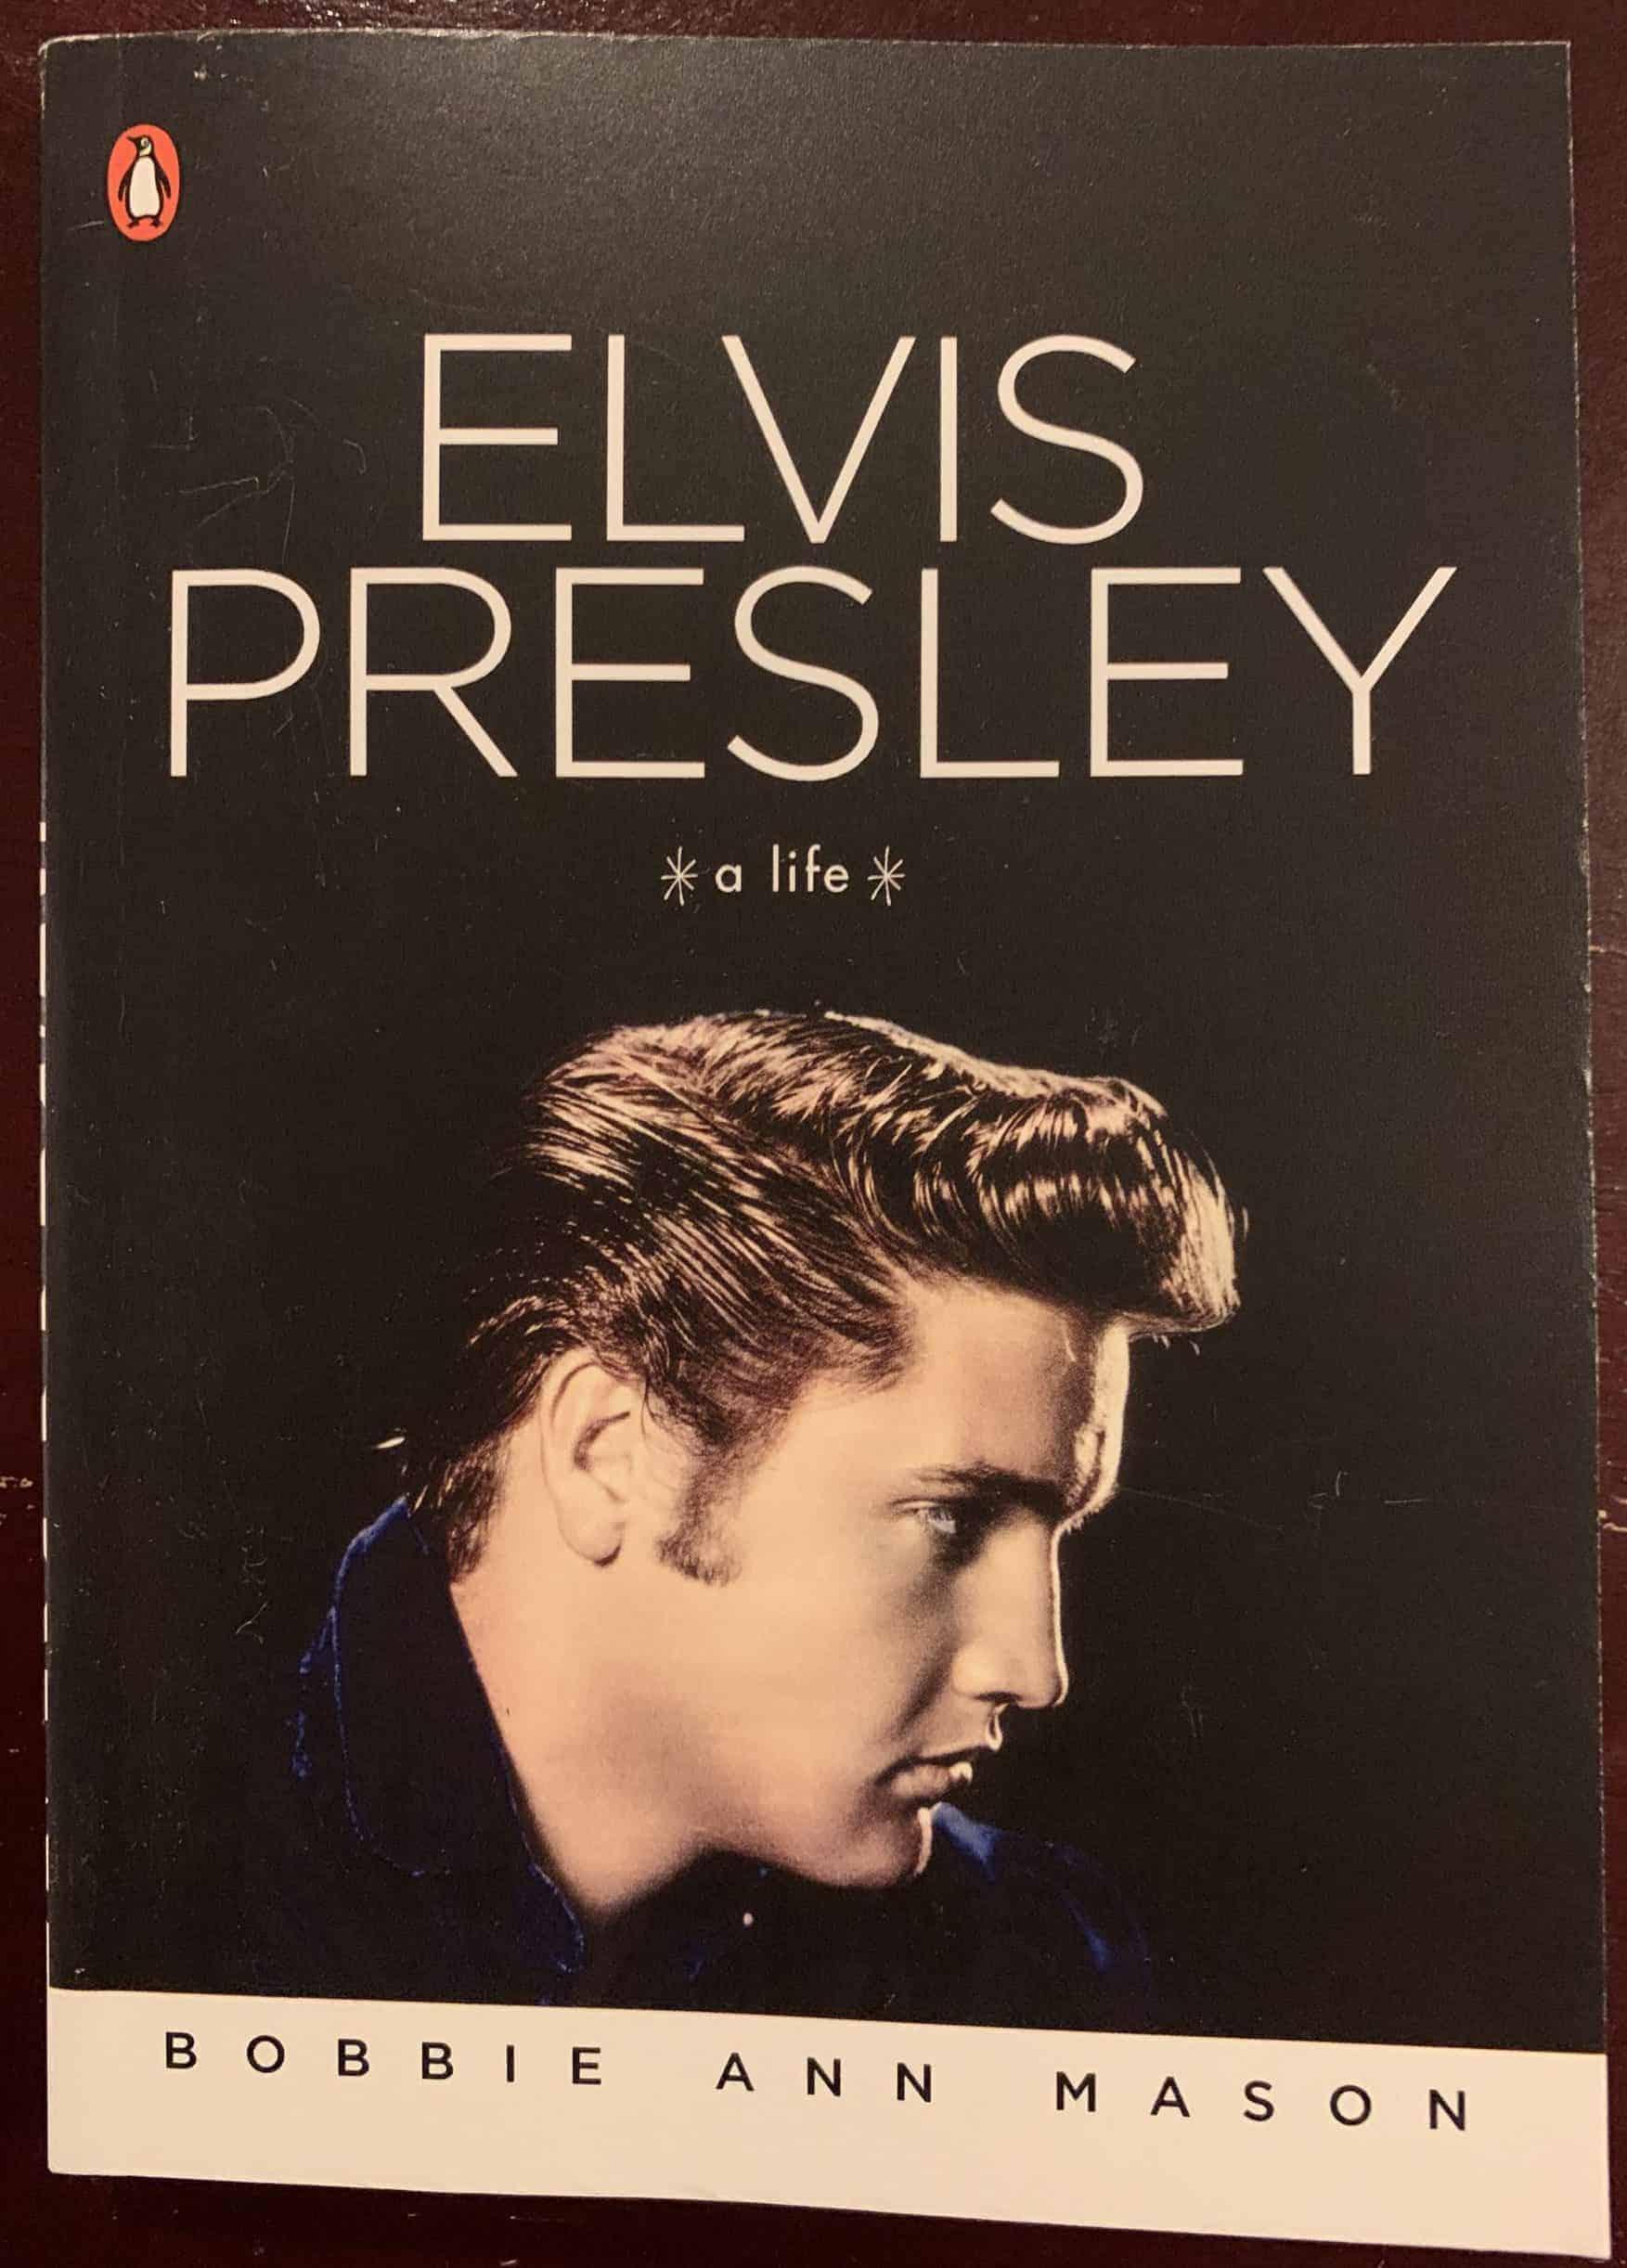 Elvis Presley - a life